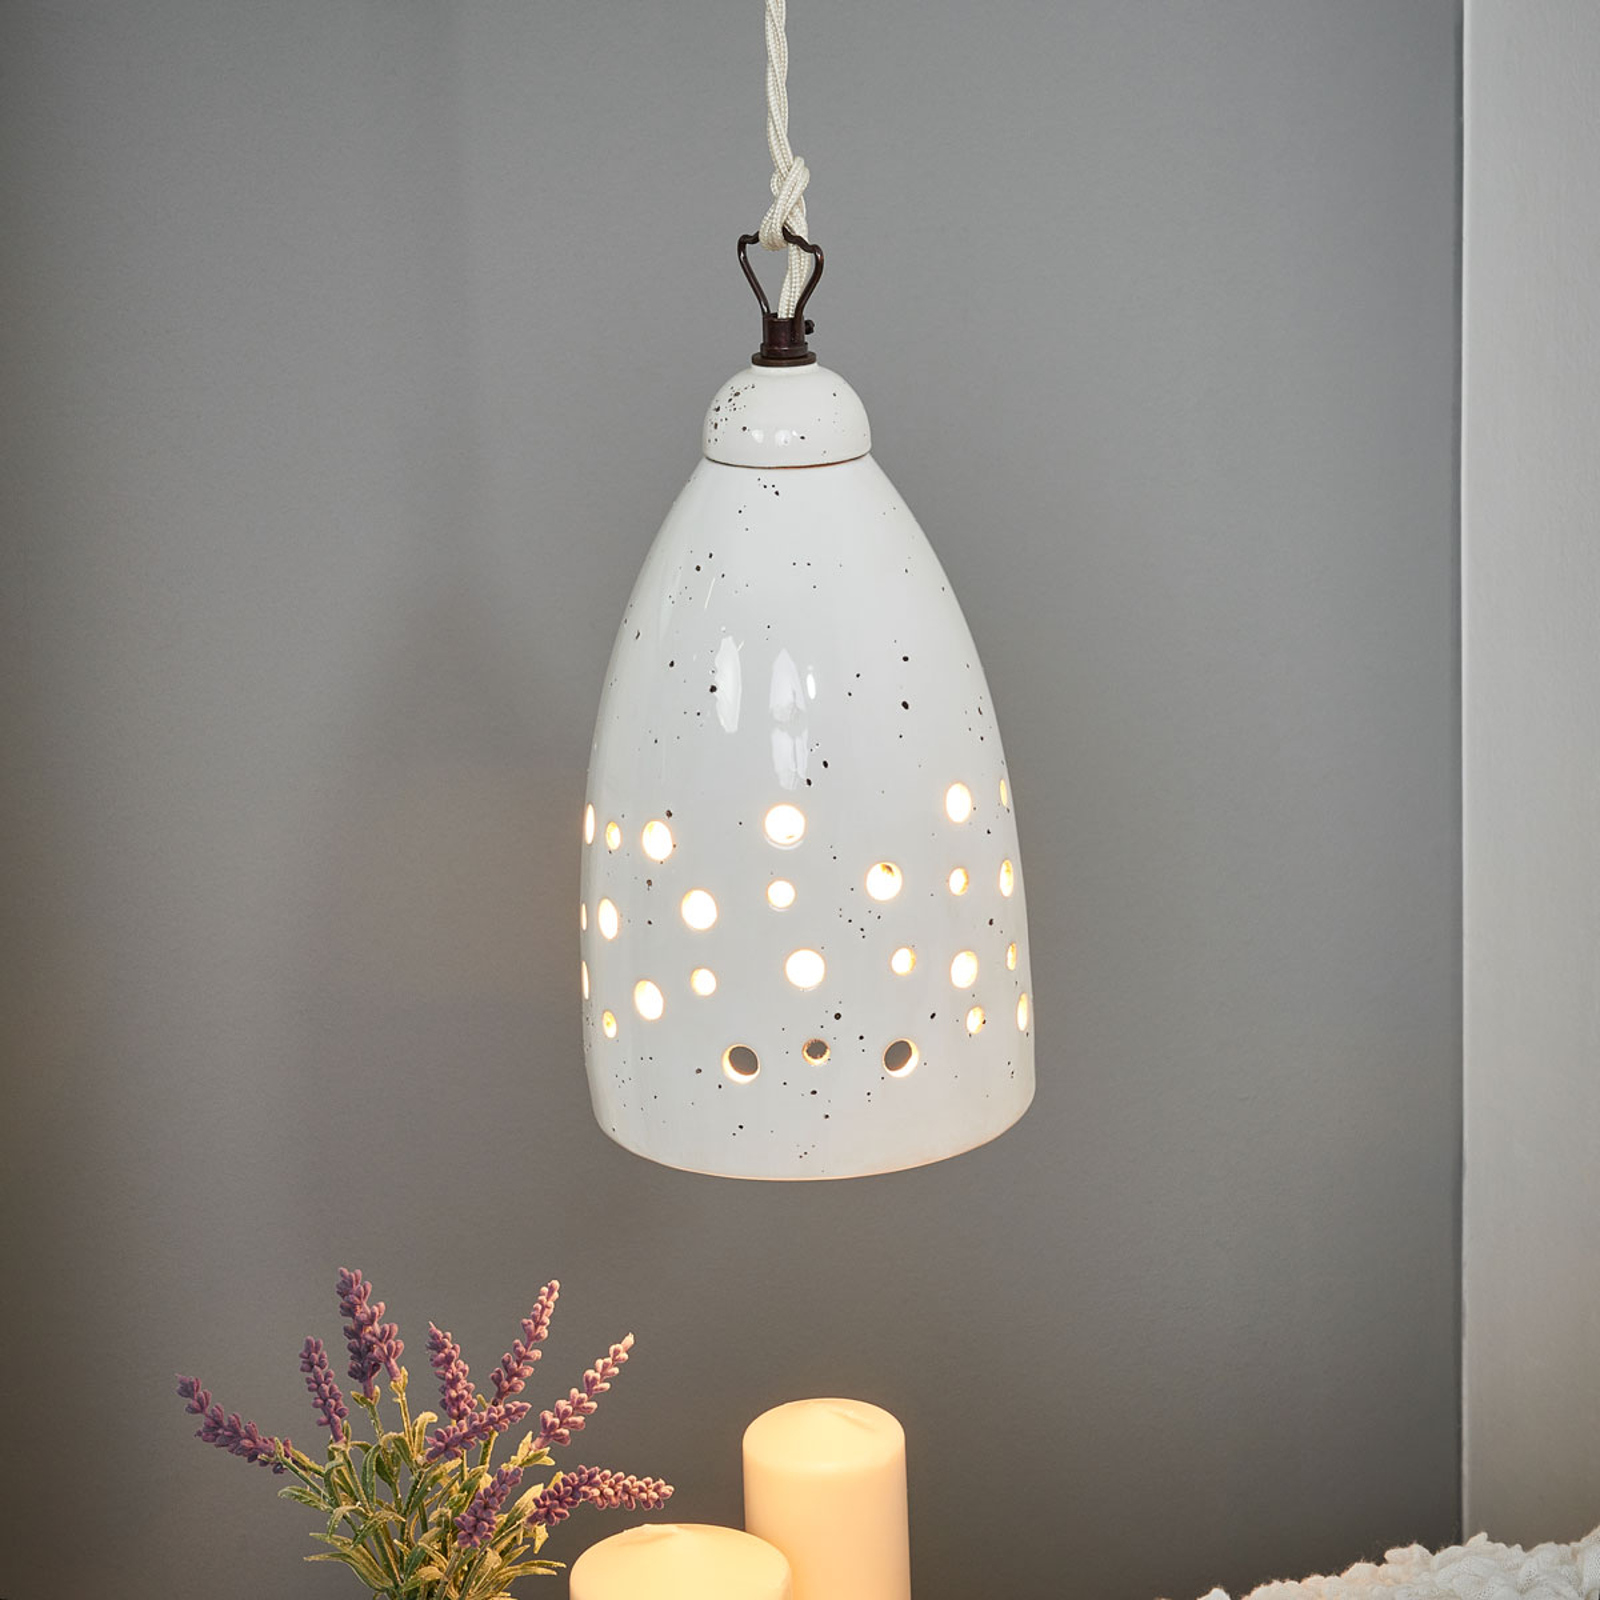 Keramiek-hanglamp Gisella, wit, bruine stippen